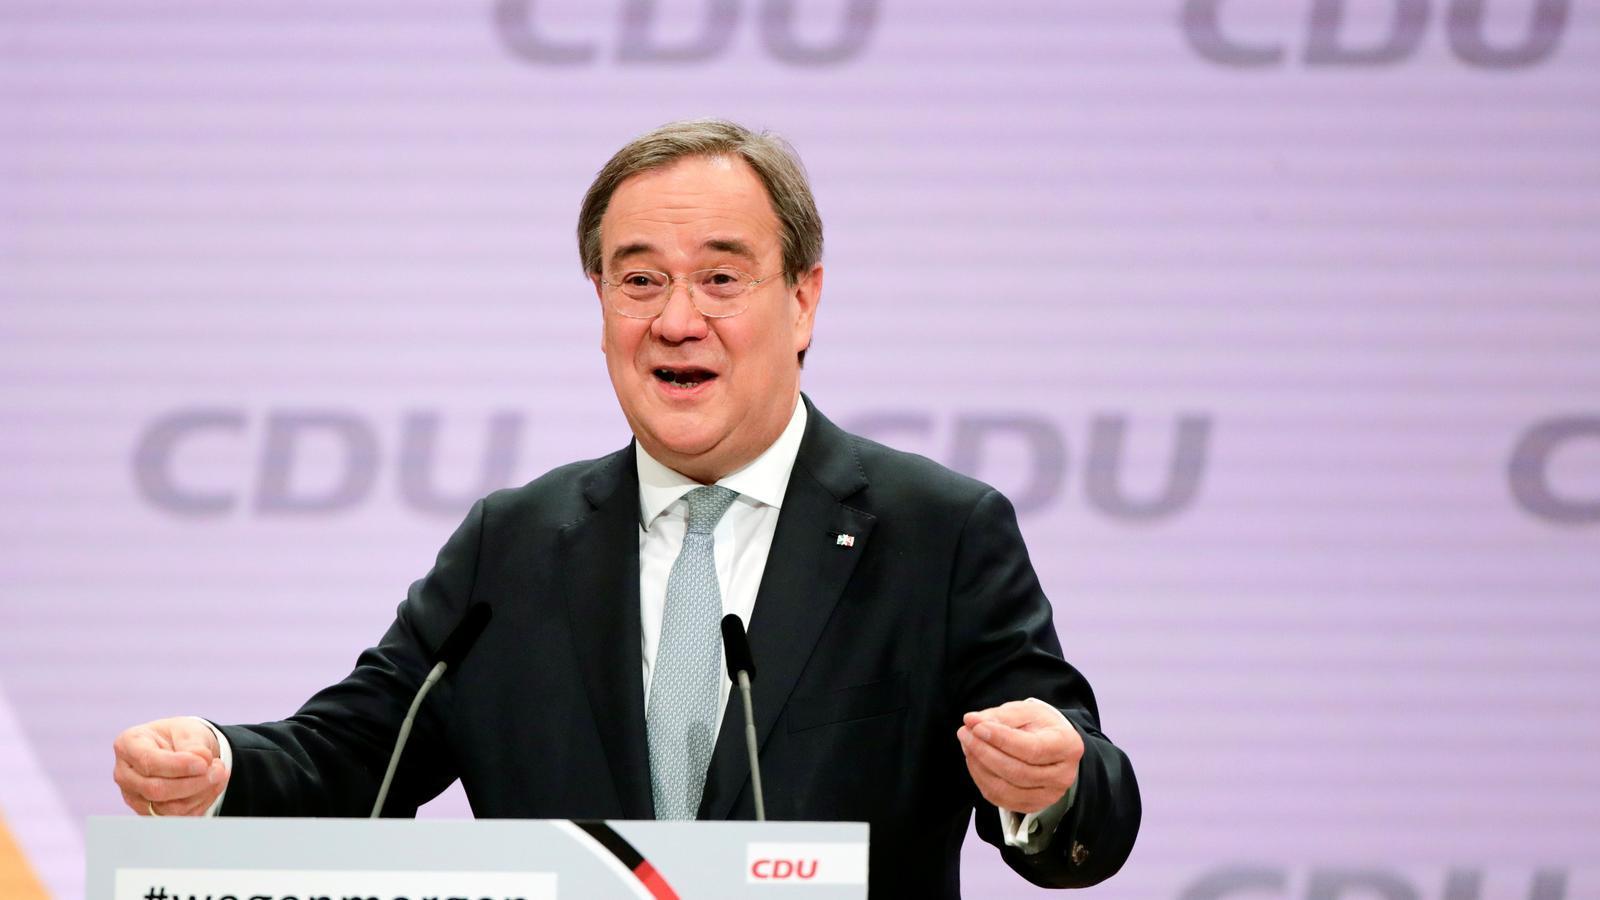 Armin Laschet, nou president de la CDU